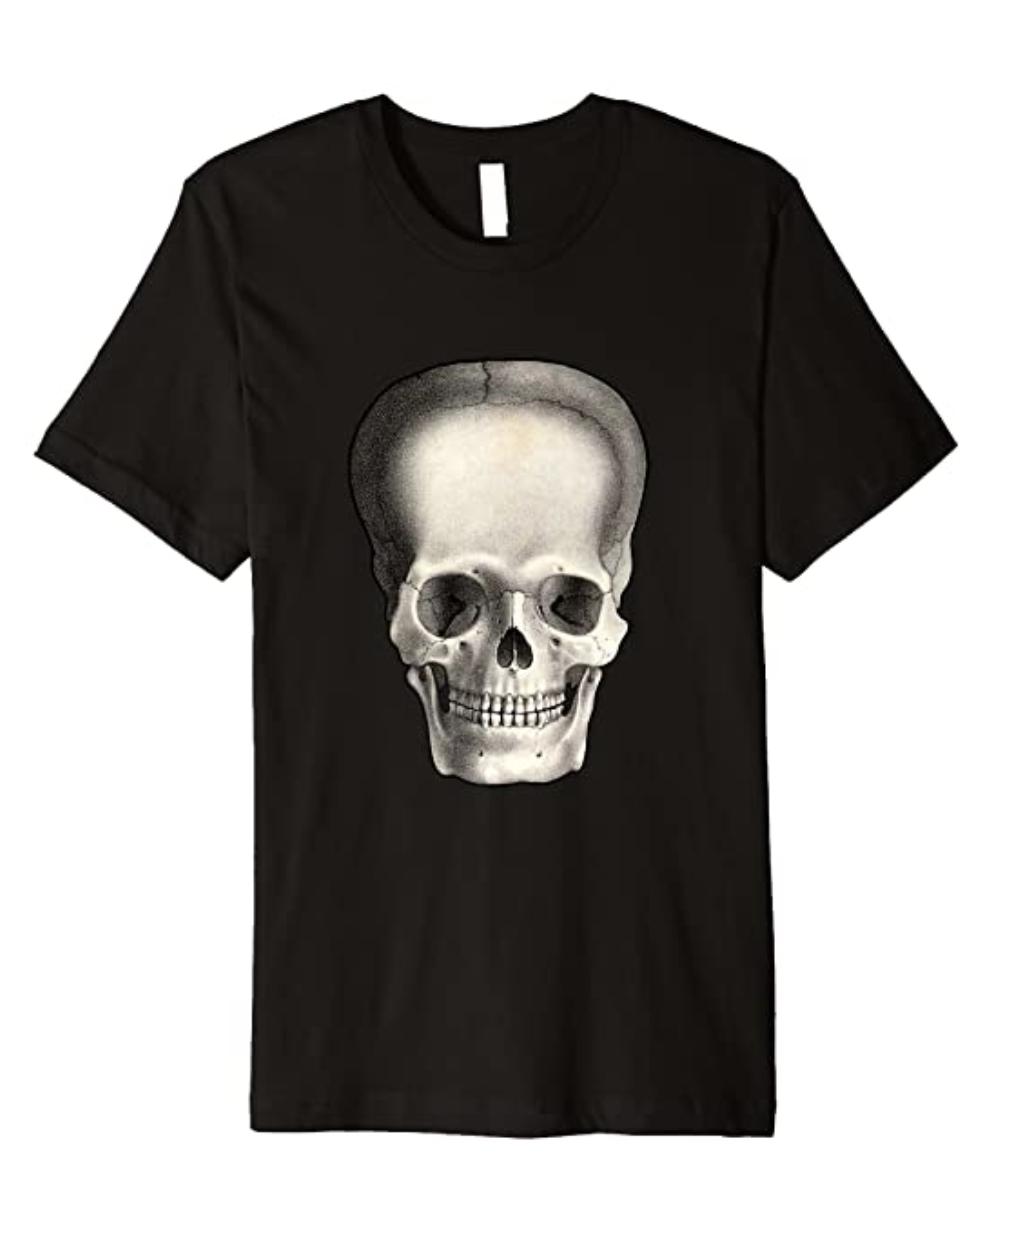 Goth Punk Vintage Skull Horror Gothic Illustrated Skeleton Premium T-Shirt